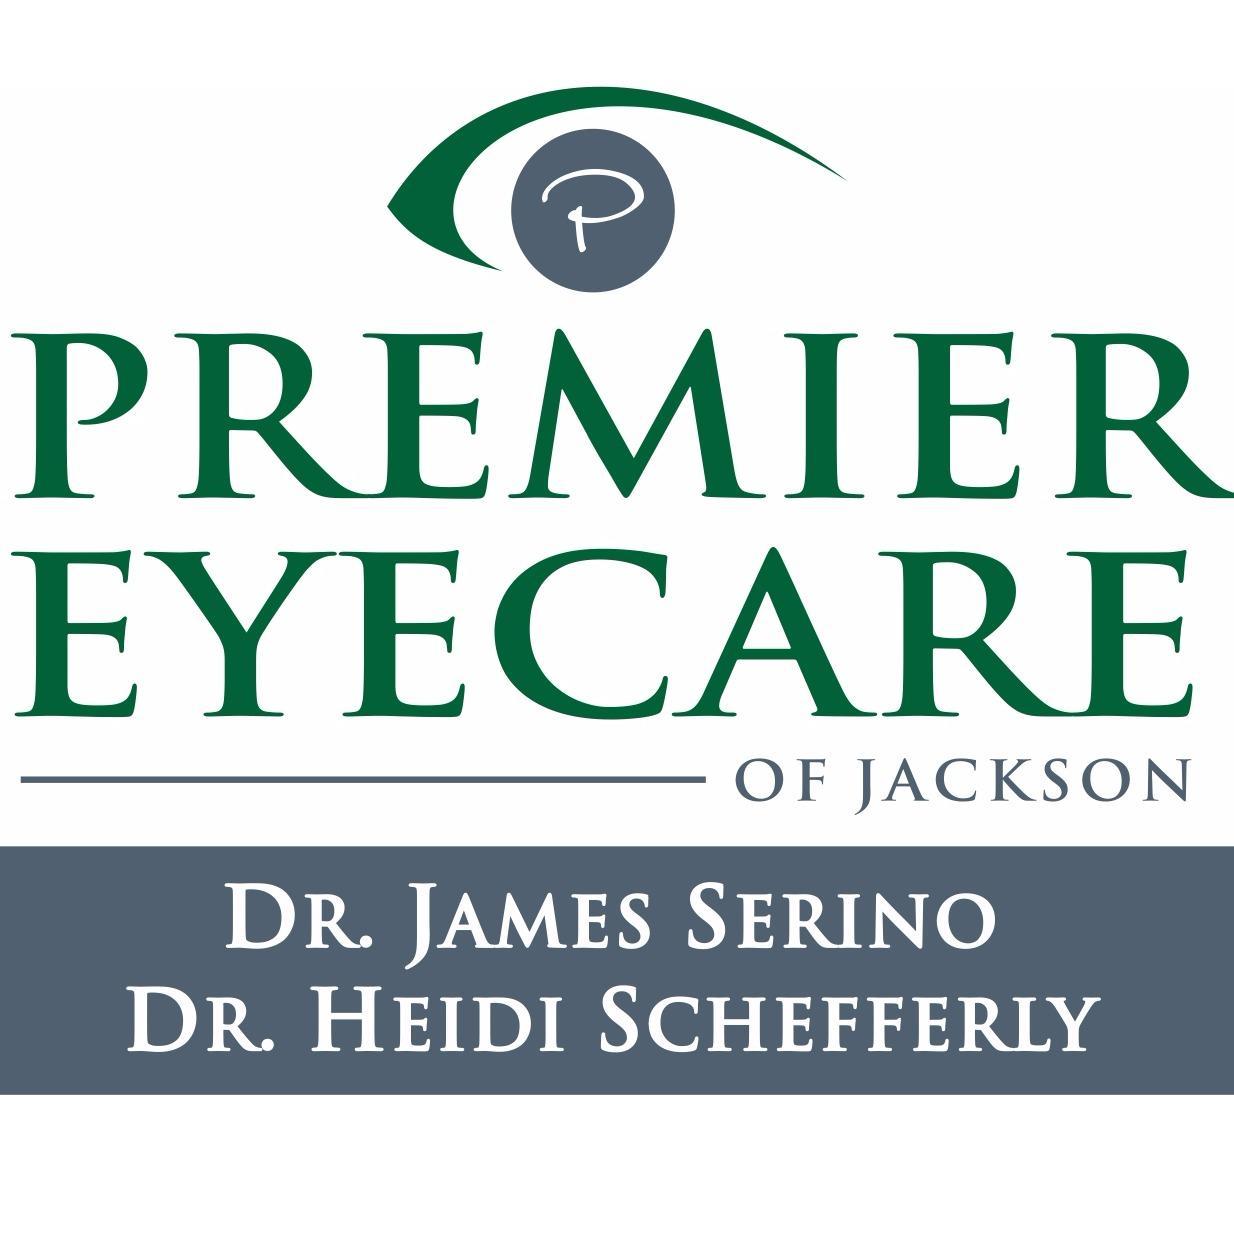 Premier Eyecare of Jackson - Jackson, MI - Optometrists